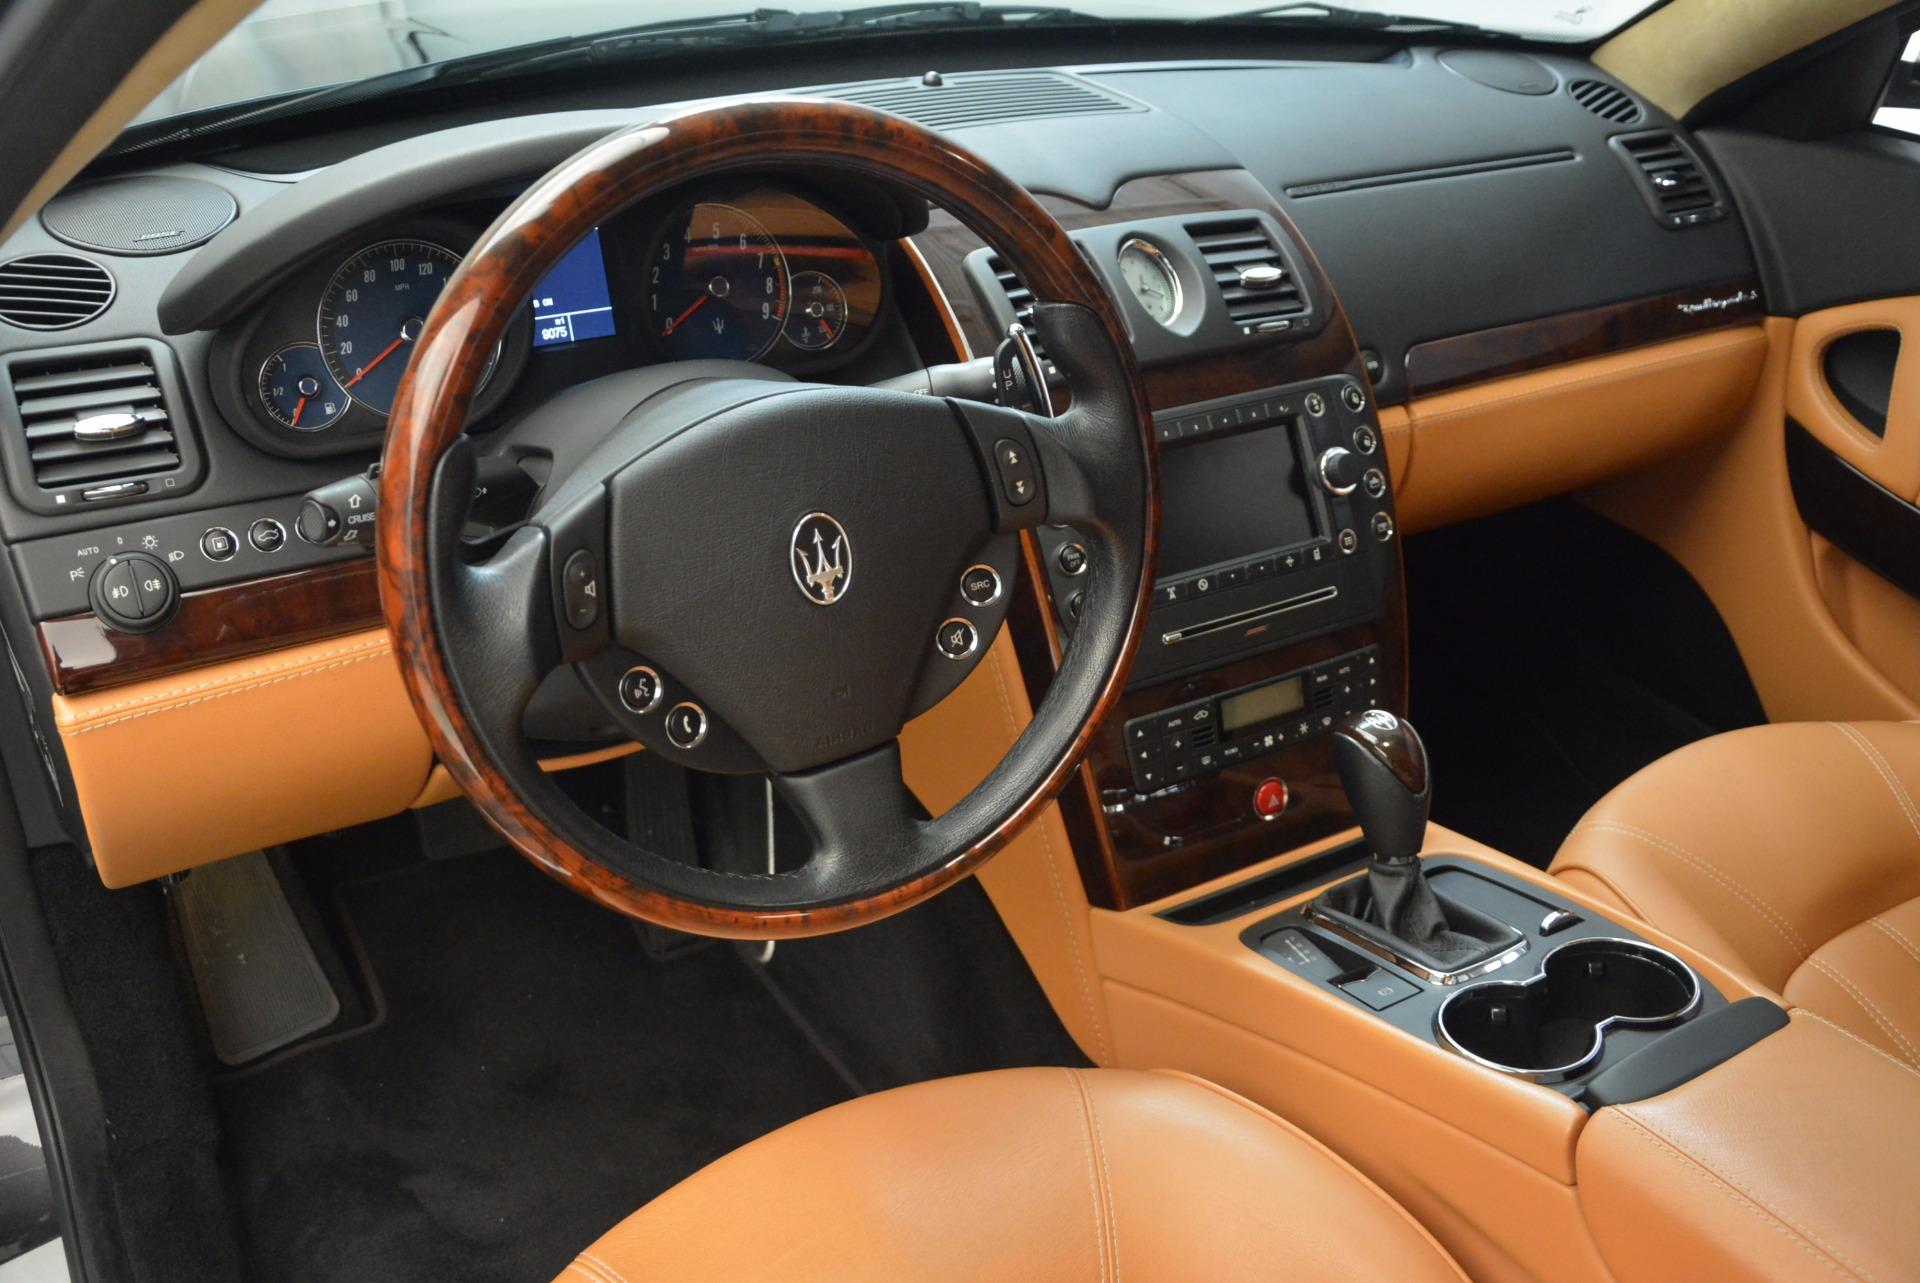 Used 2010 Maserati Quattroporte S For Sale In Westport, CT 1551_p25